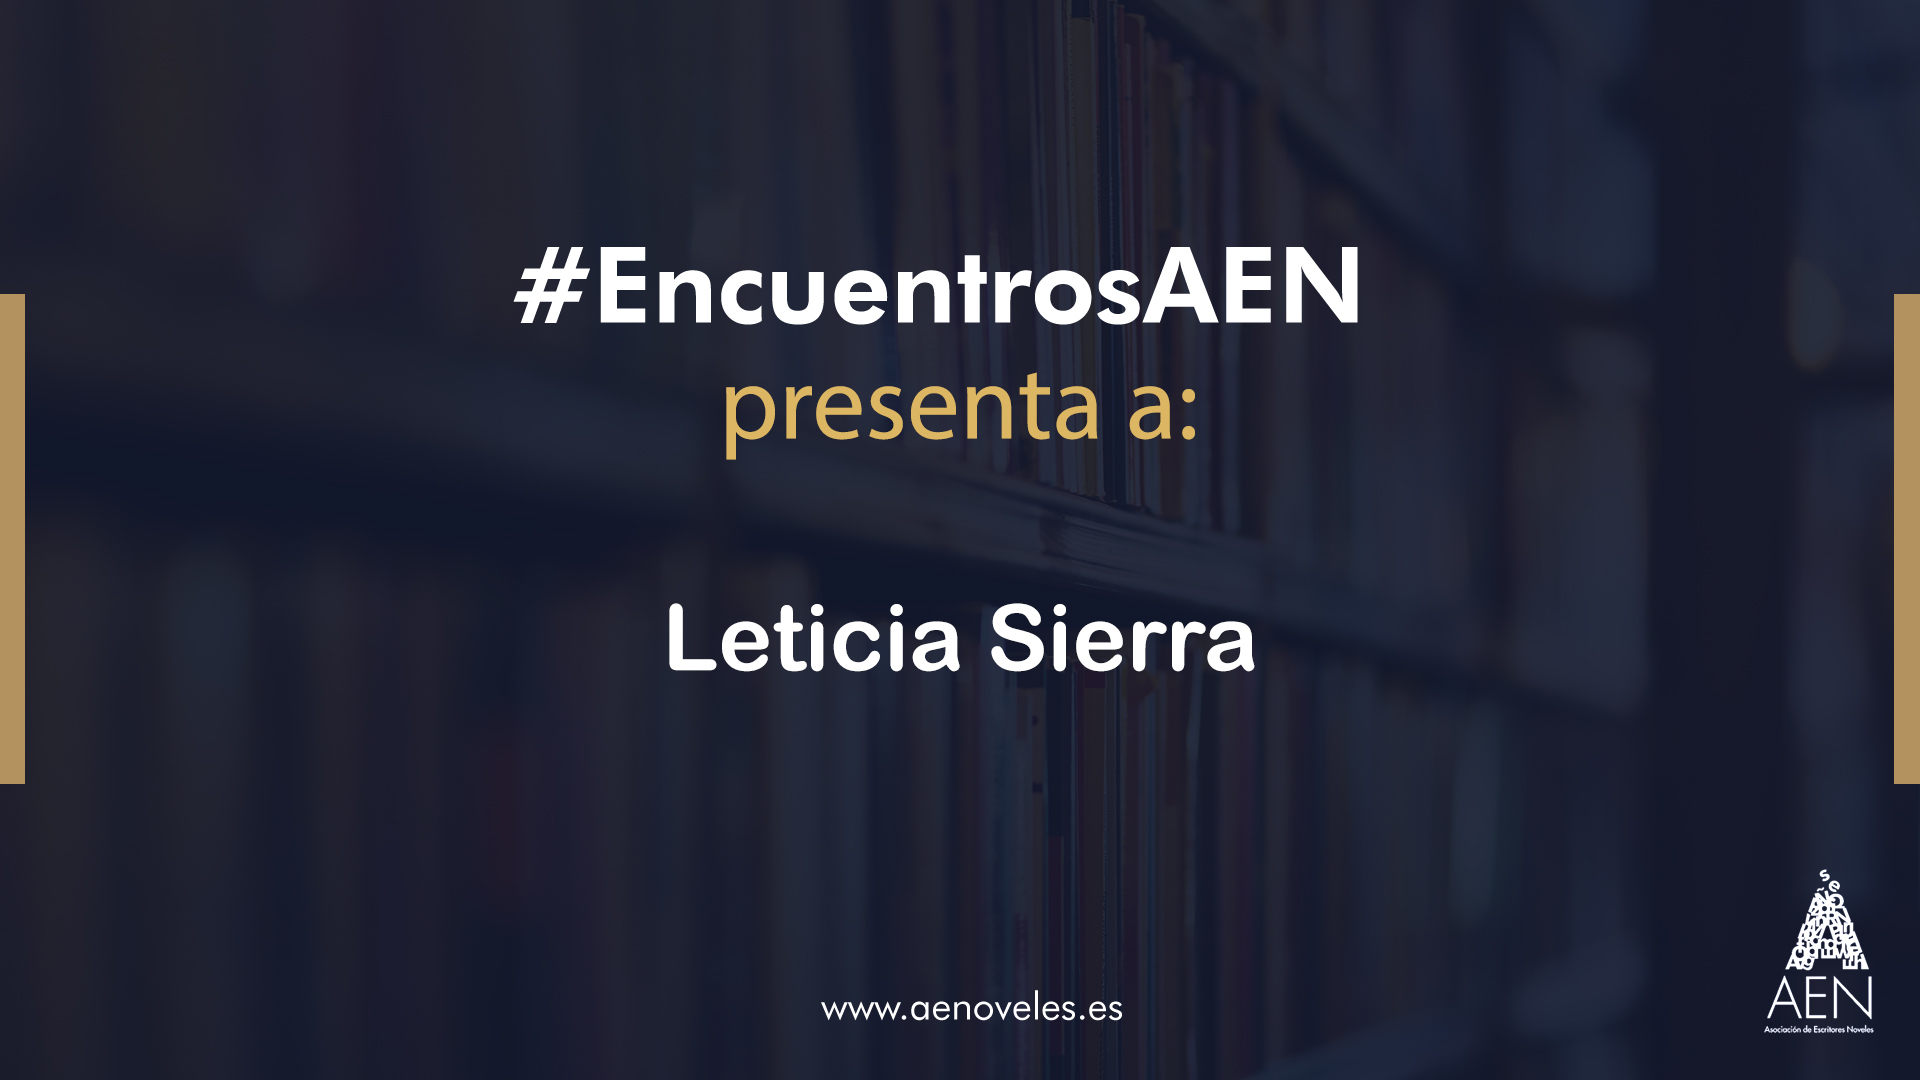 EncuentroAEN con Leticia Sierra